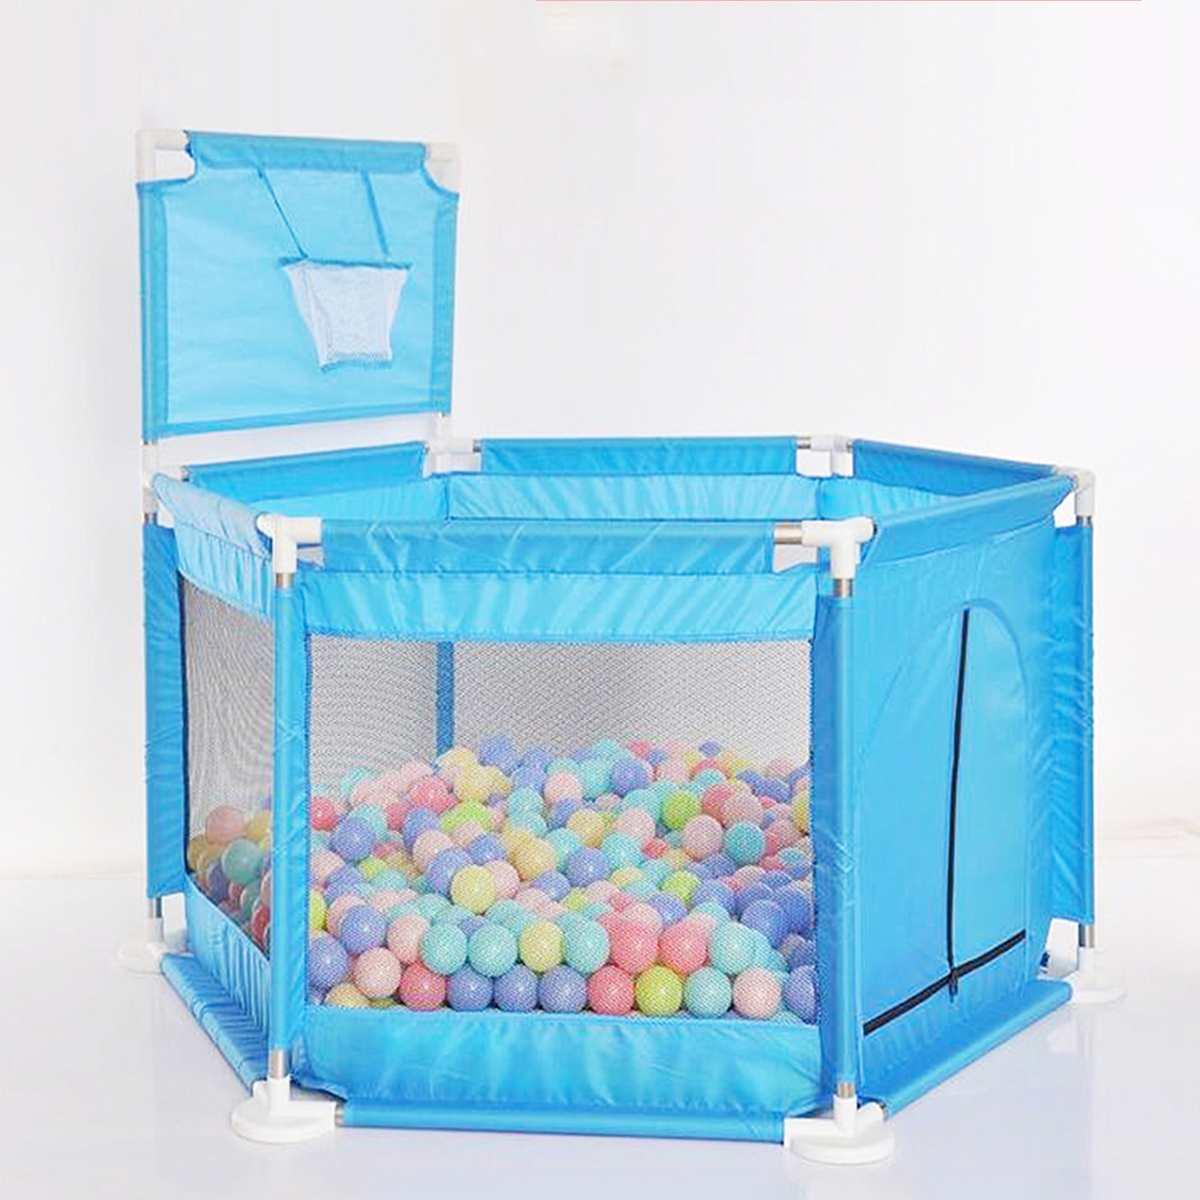 Baby Dry Pool Crawling Playground Children Playpen Kids Safety Barrier Children Activity Centers Kids Fence Kids Playgound Fence